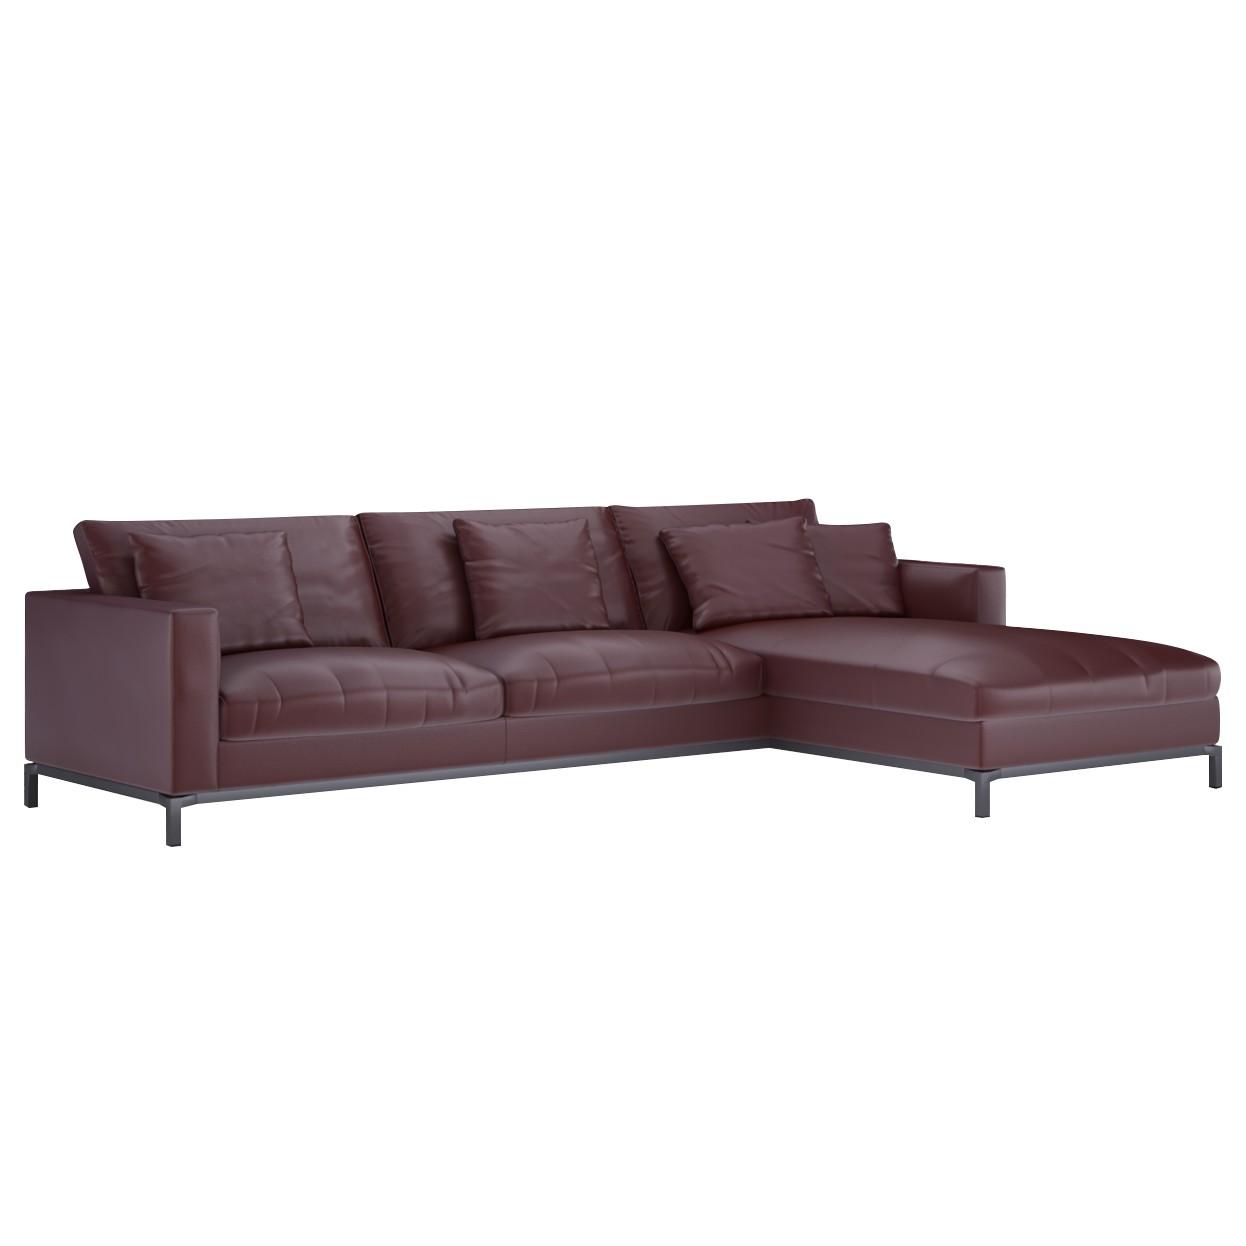 ecksofa fenice 3 sitzer mit gro er recami re. Black Bedroom Furniture Sets. Home Design Ideas